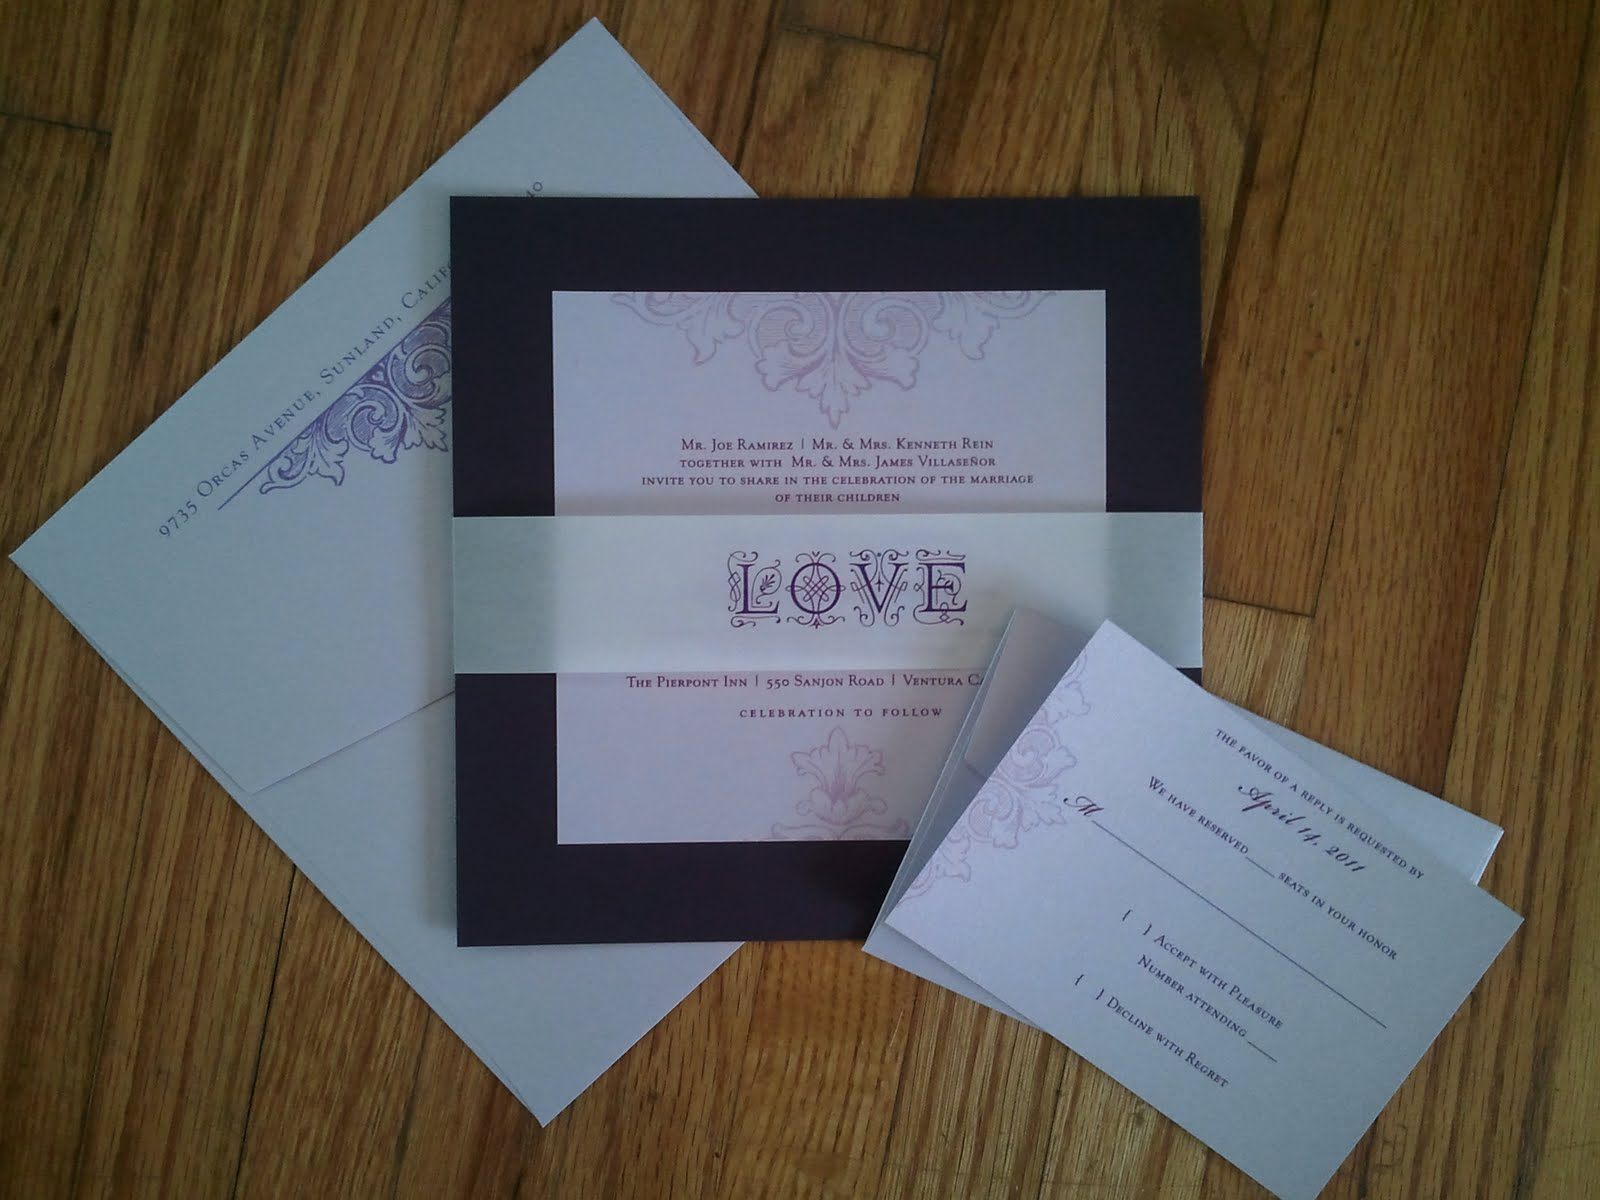 Basic Wedding Invitation Wording: Basic Invites Wedding Invitations